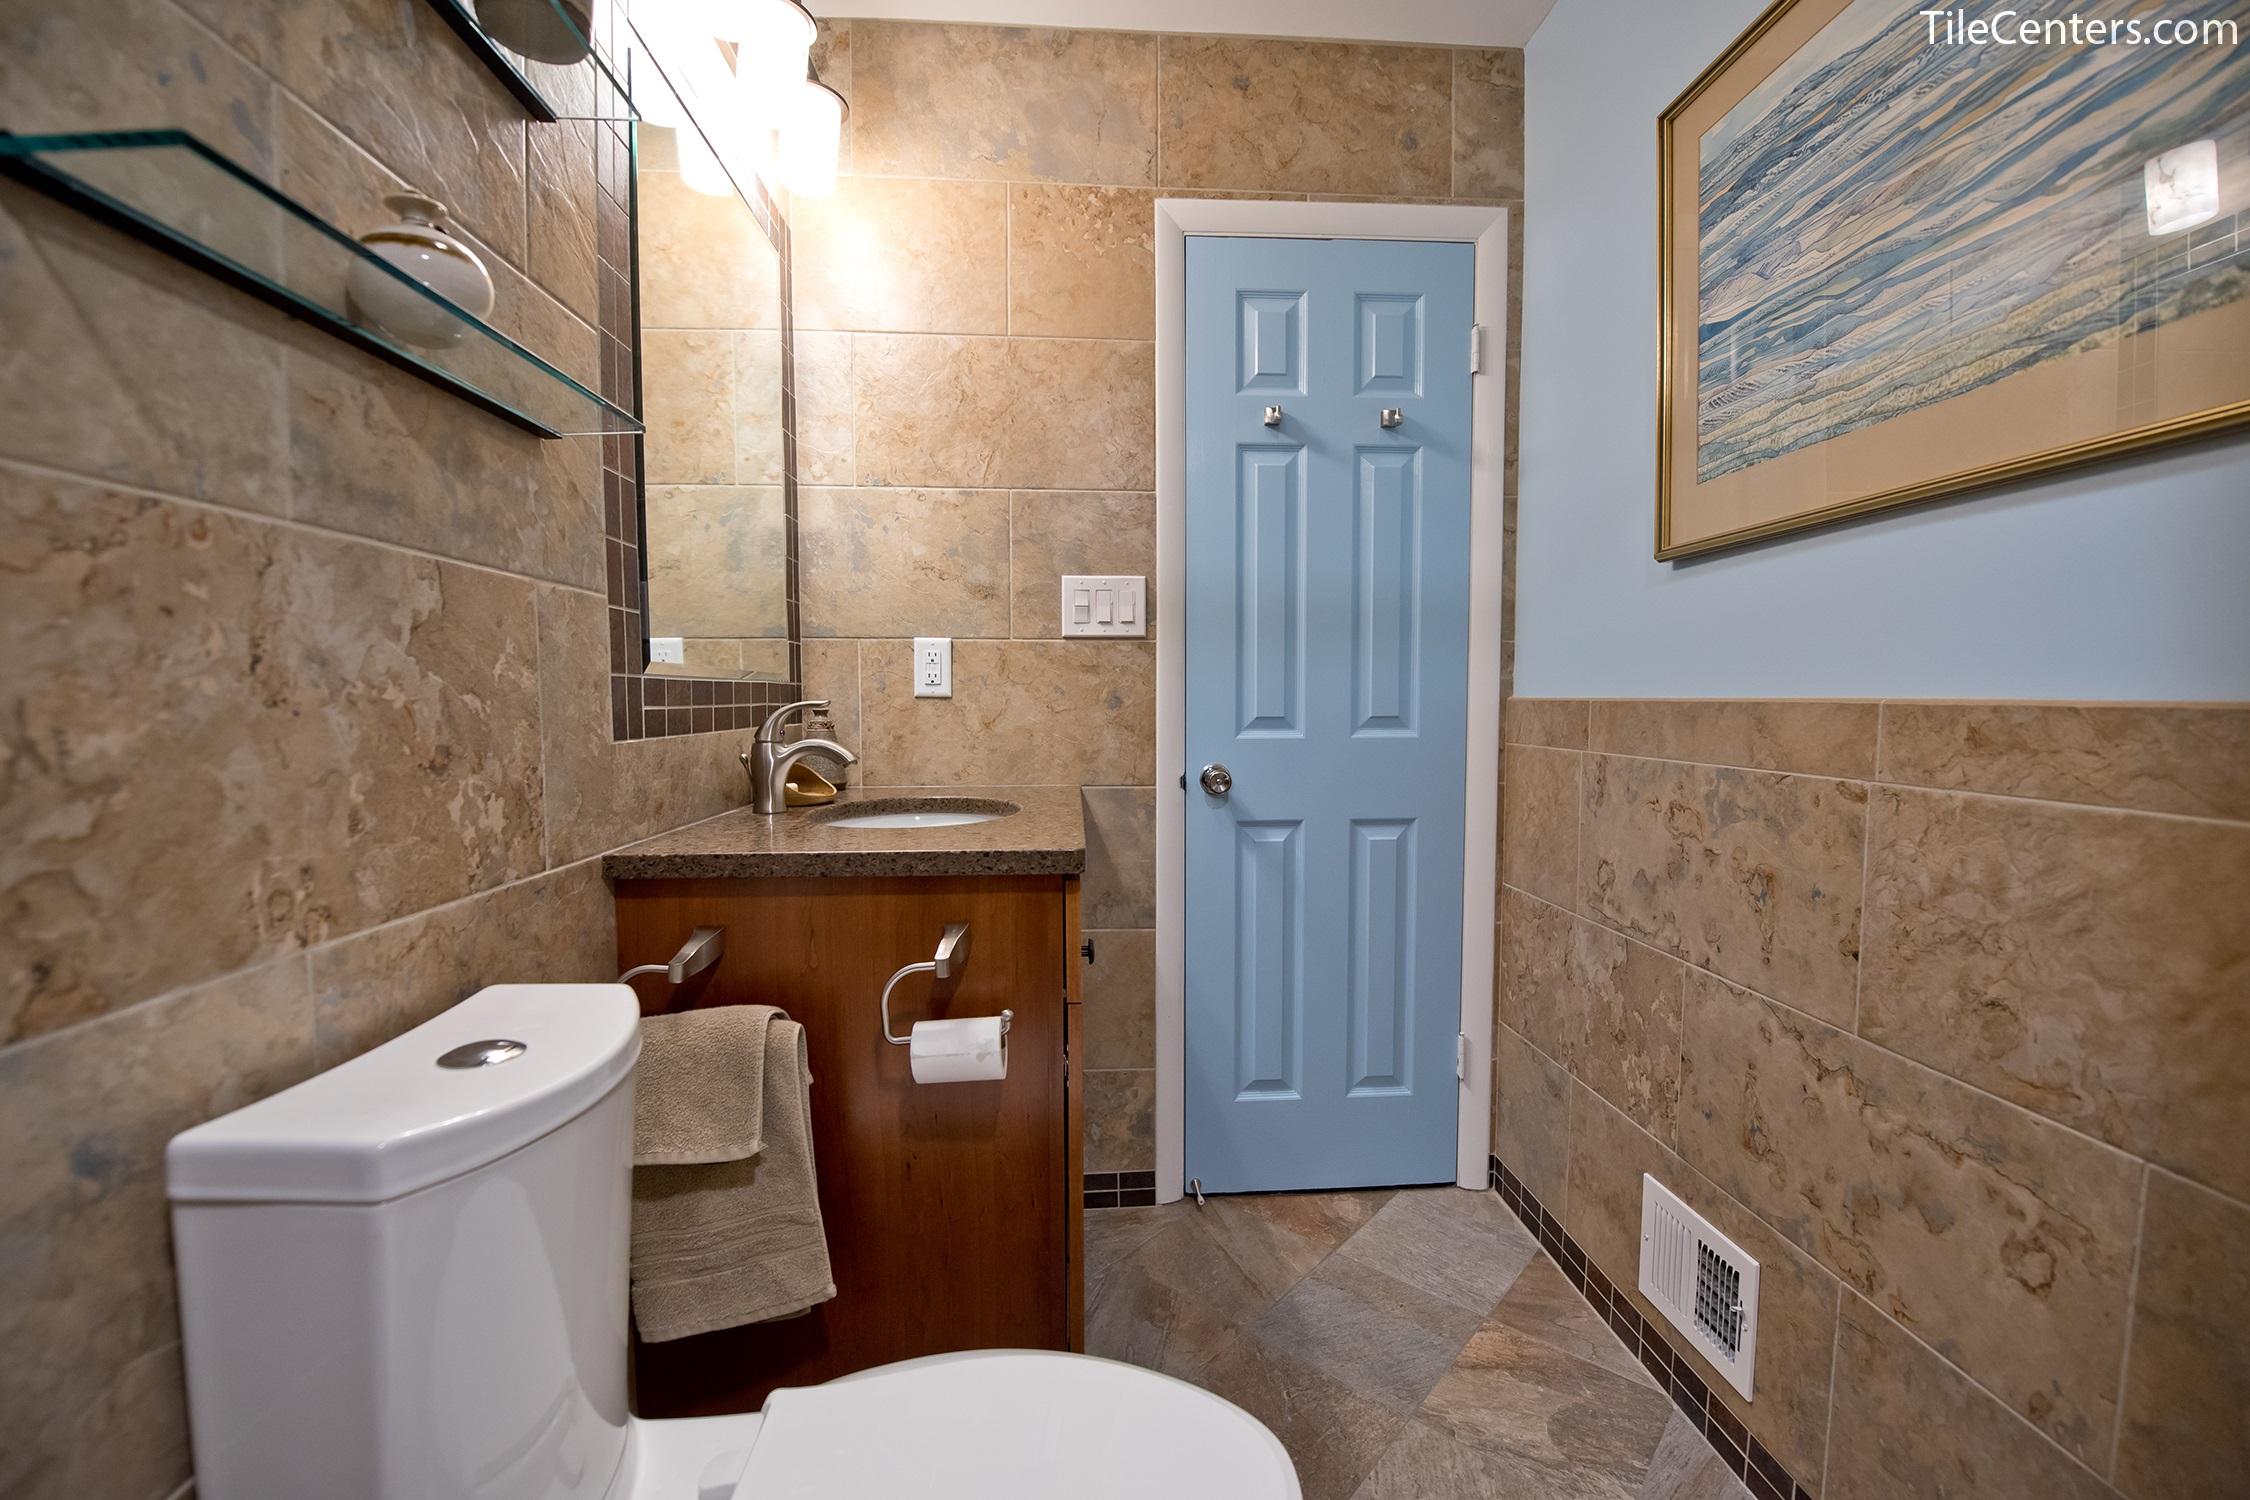 Bathroom Remodel Farcroft Terrace Gaithersburg Md 20879